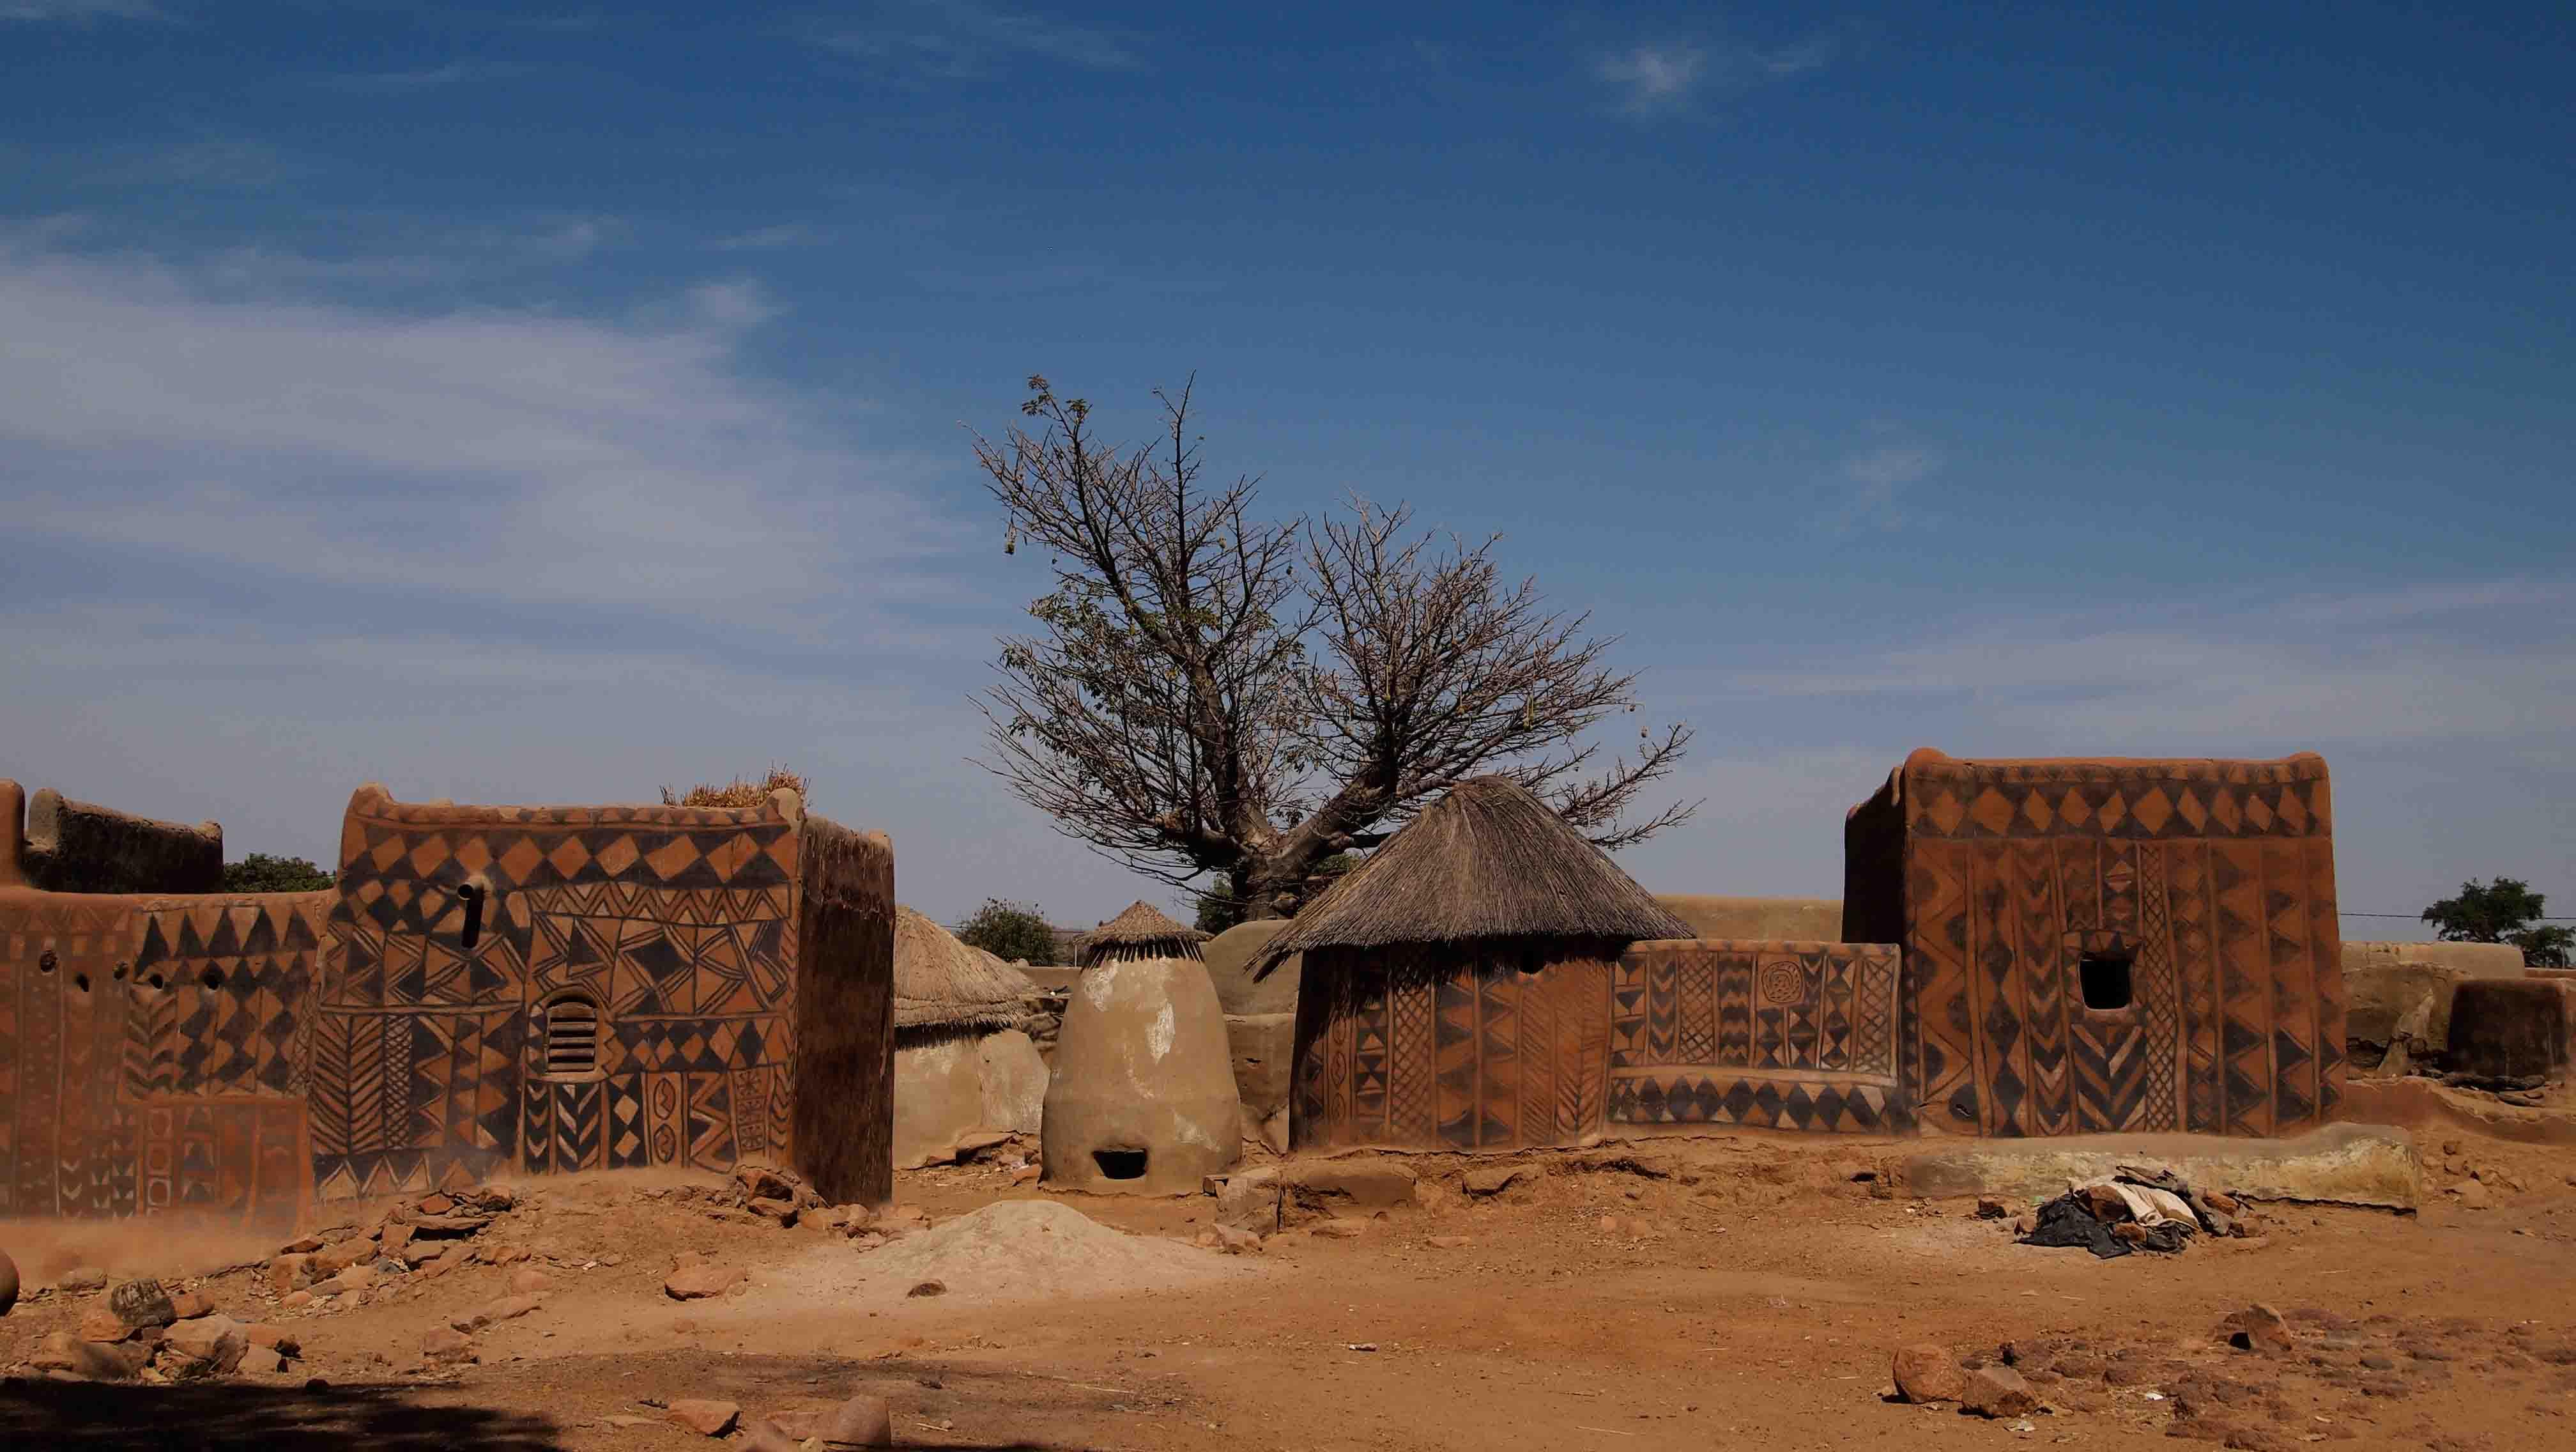 Tiebele-Burkina-Faso